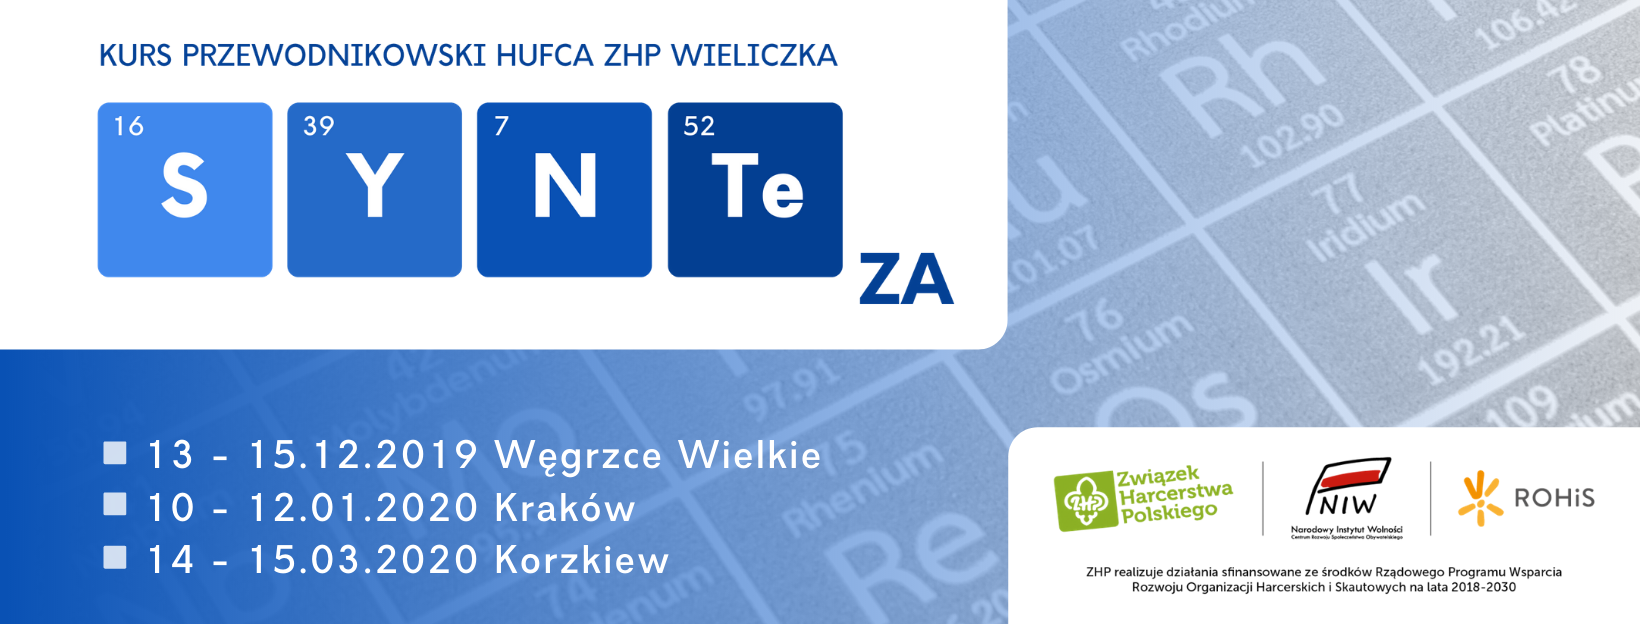 https://wieliczka.zhp.pl/wp-content/uploads/2019/11/SYNTEZA-zdjęcie-w-tle.png